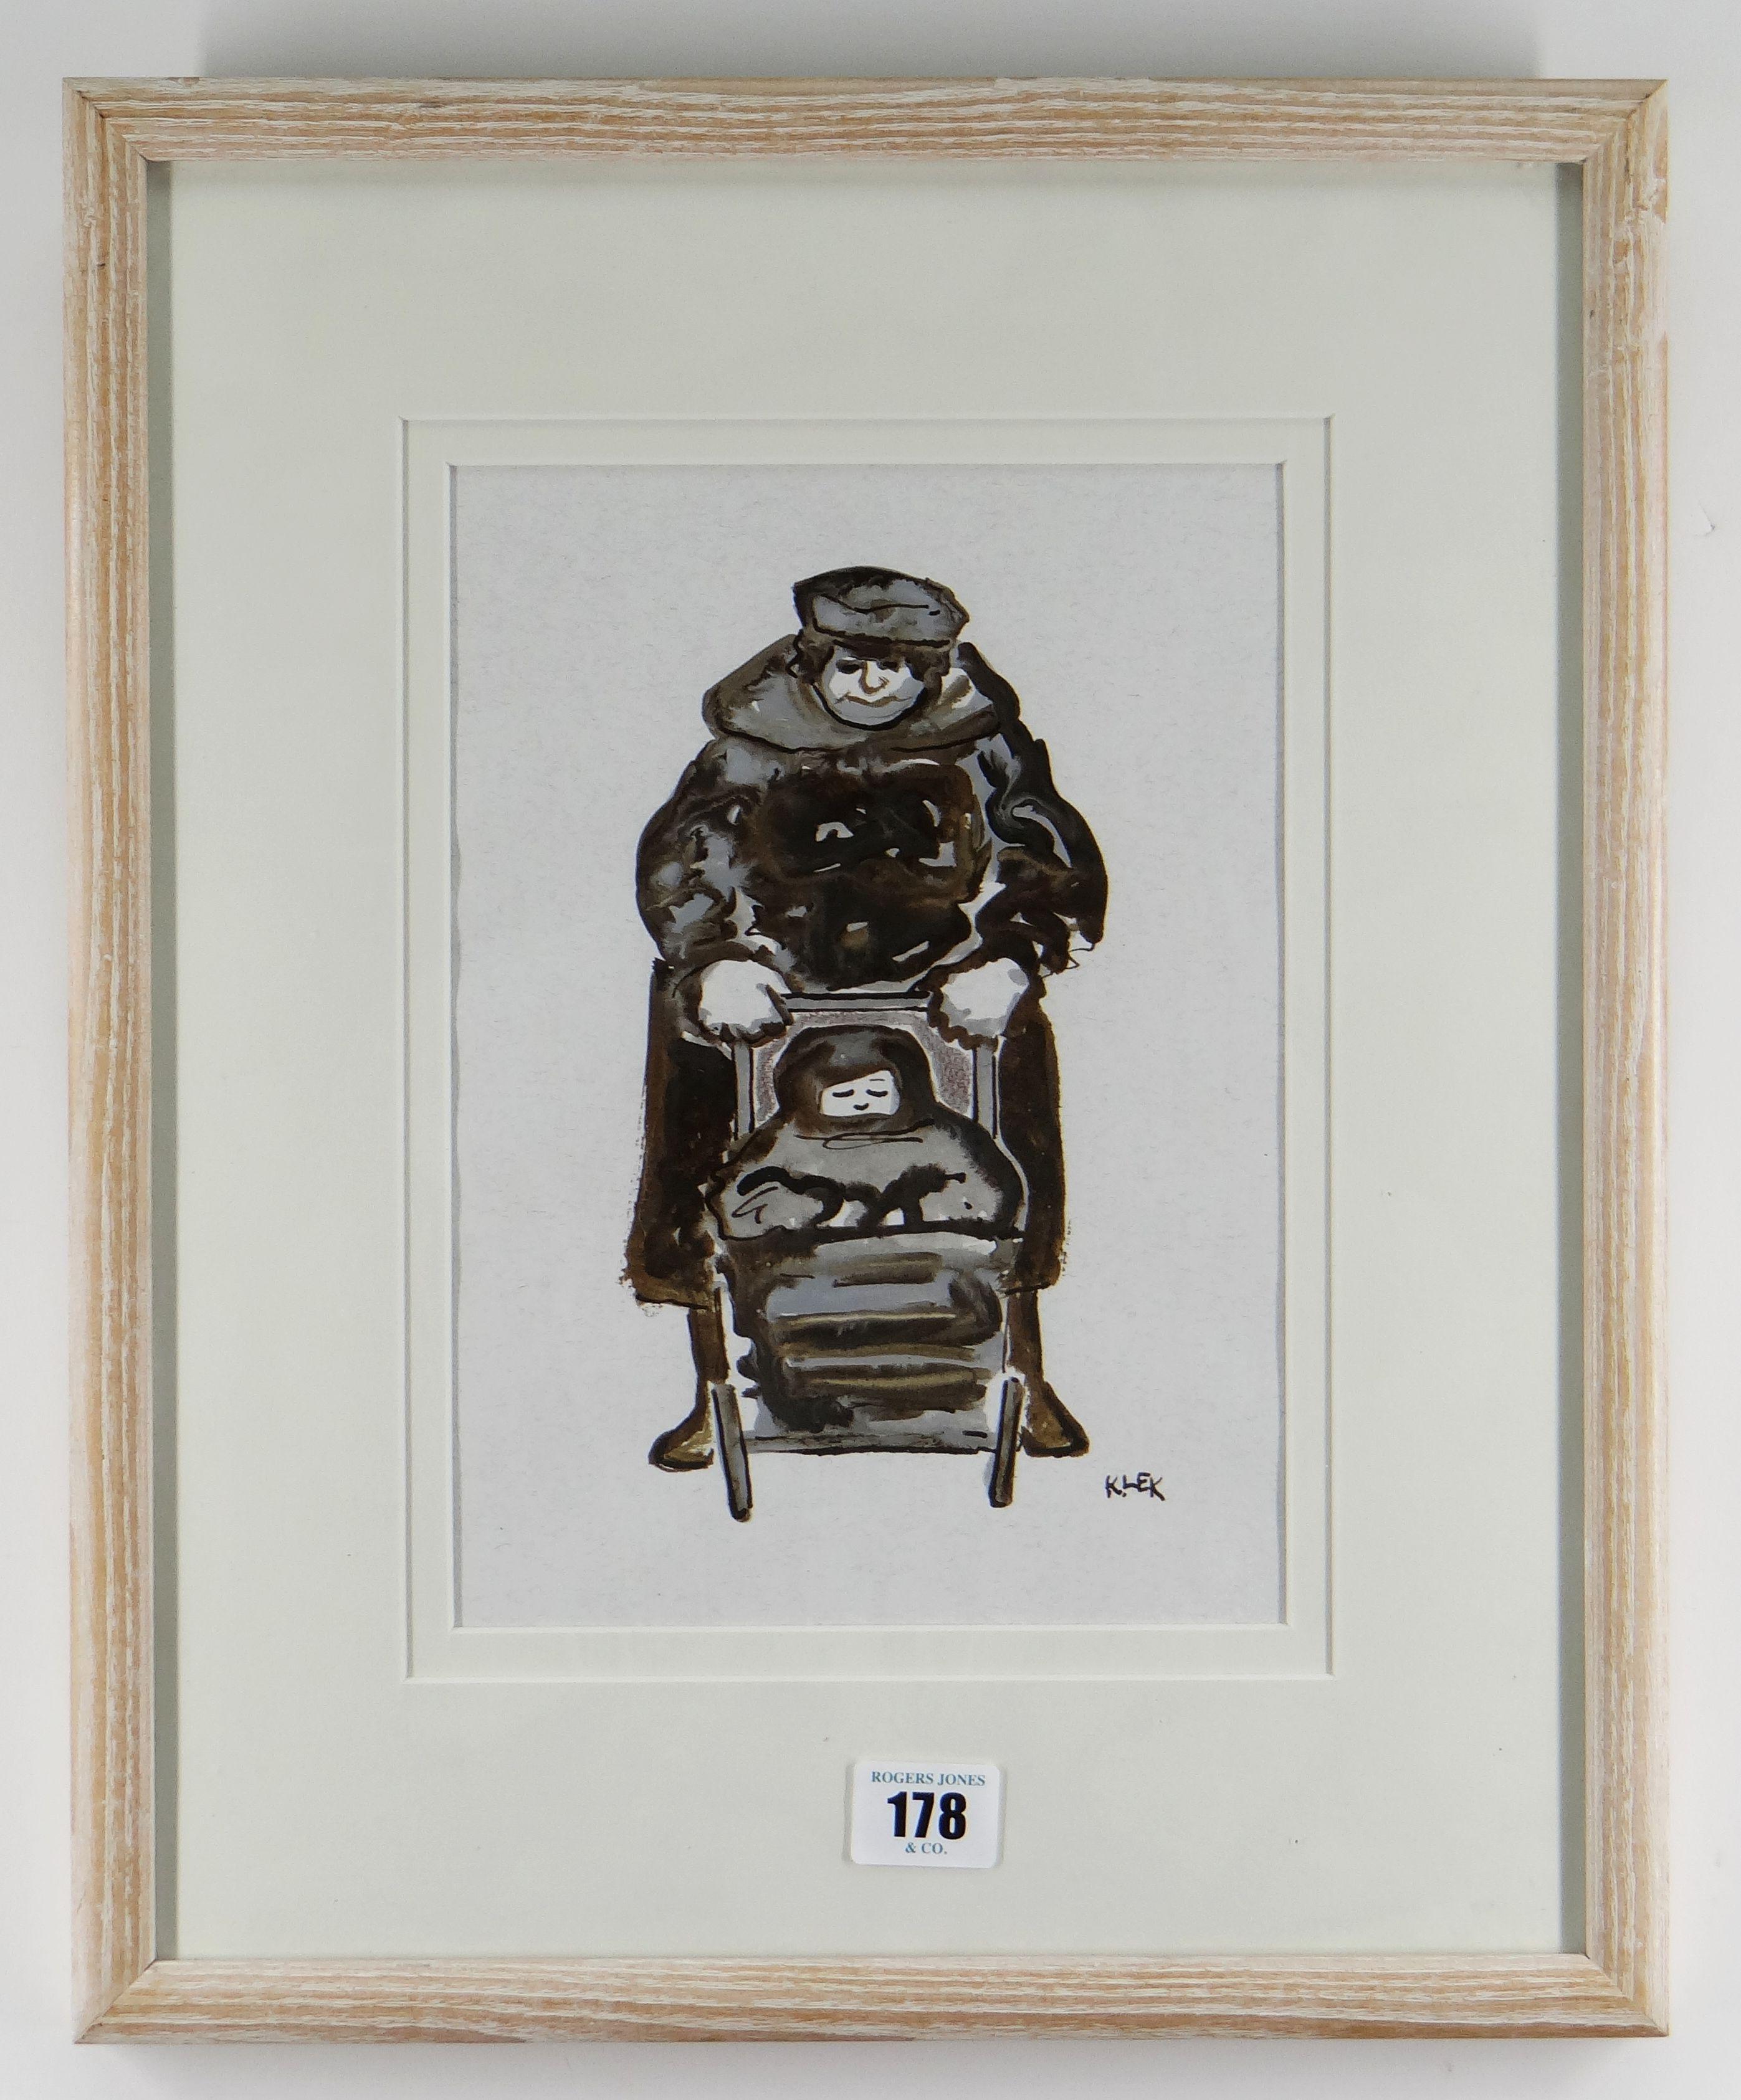 KAREL LEK mixed media - lady pushing child in a pram, entitled verso 'Buggy', signed, 24 x 17cms - Image 2 of 2